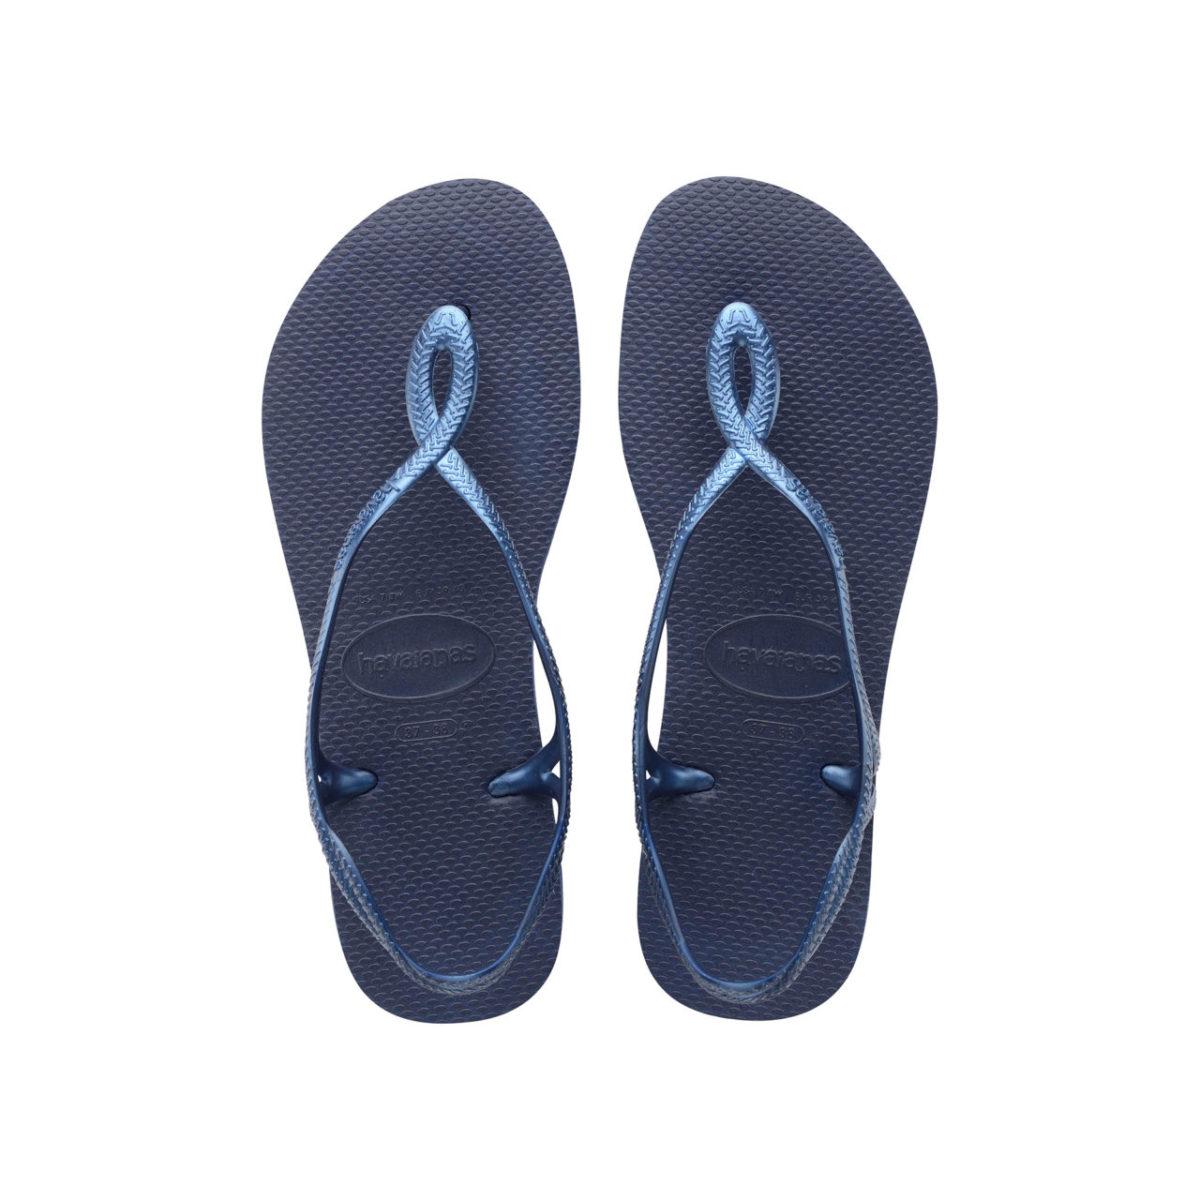 Havaianas Flipflops Sandale Badeschuh Zehentrenner Luna Navy Blue Badelatschen Badeschlappen Aufsicht